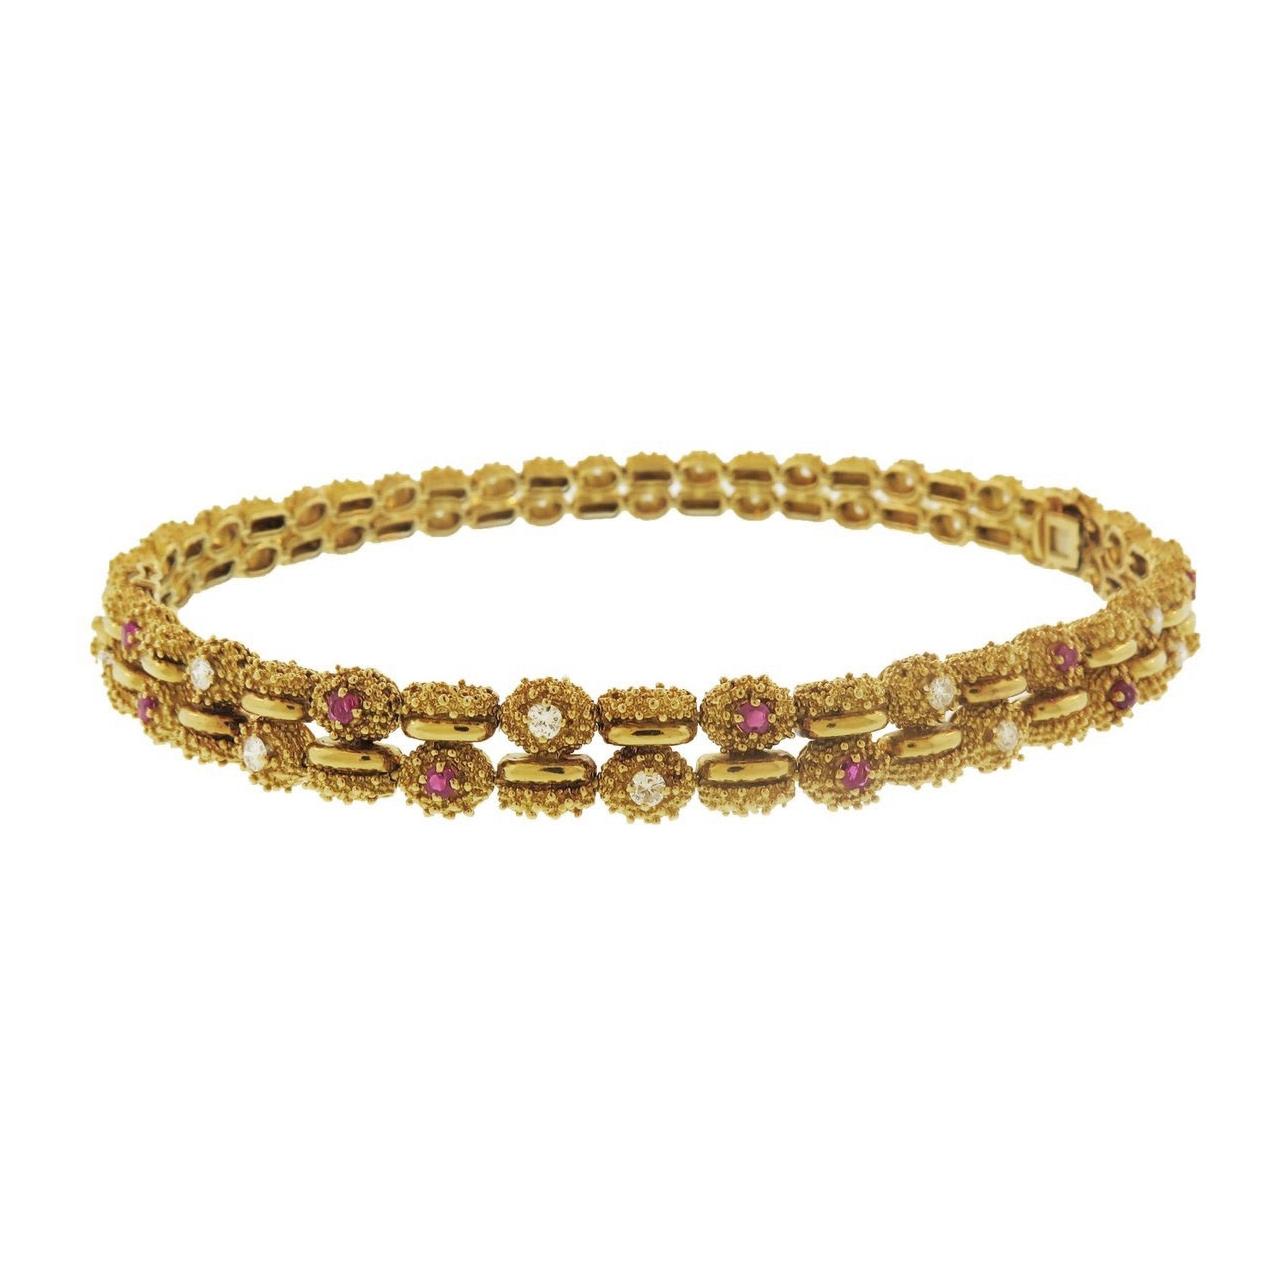 Tiffany & Co. 1960s Diamond and Ruby Link Bracelet